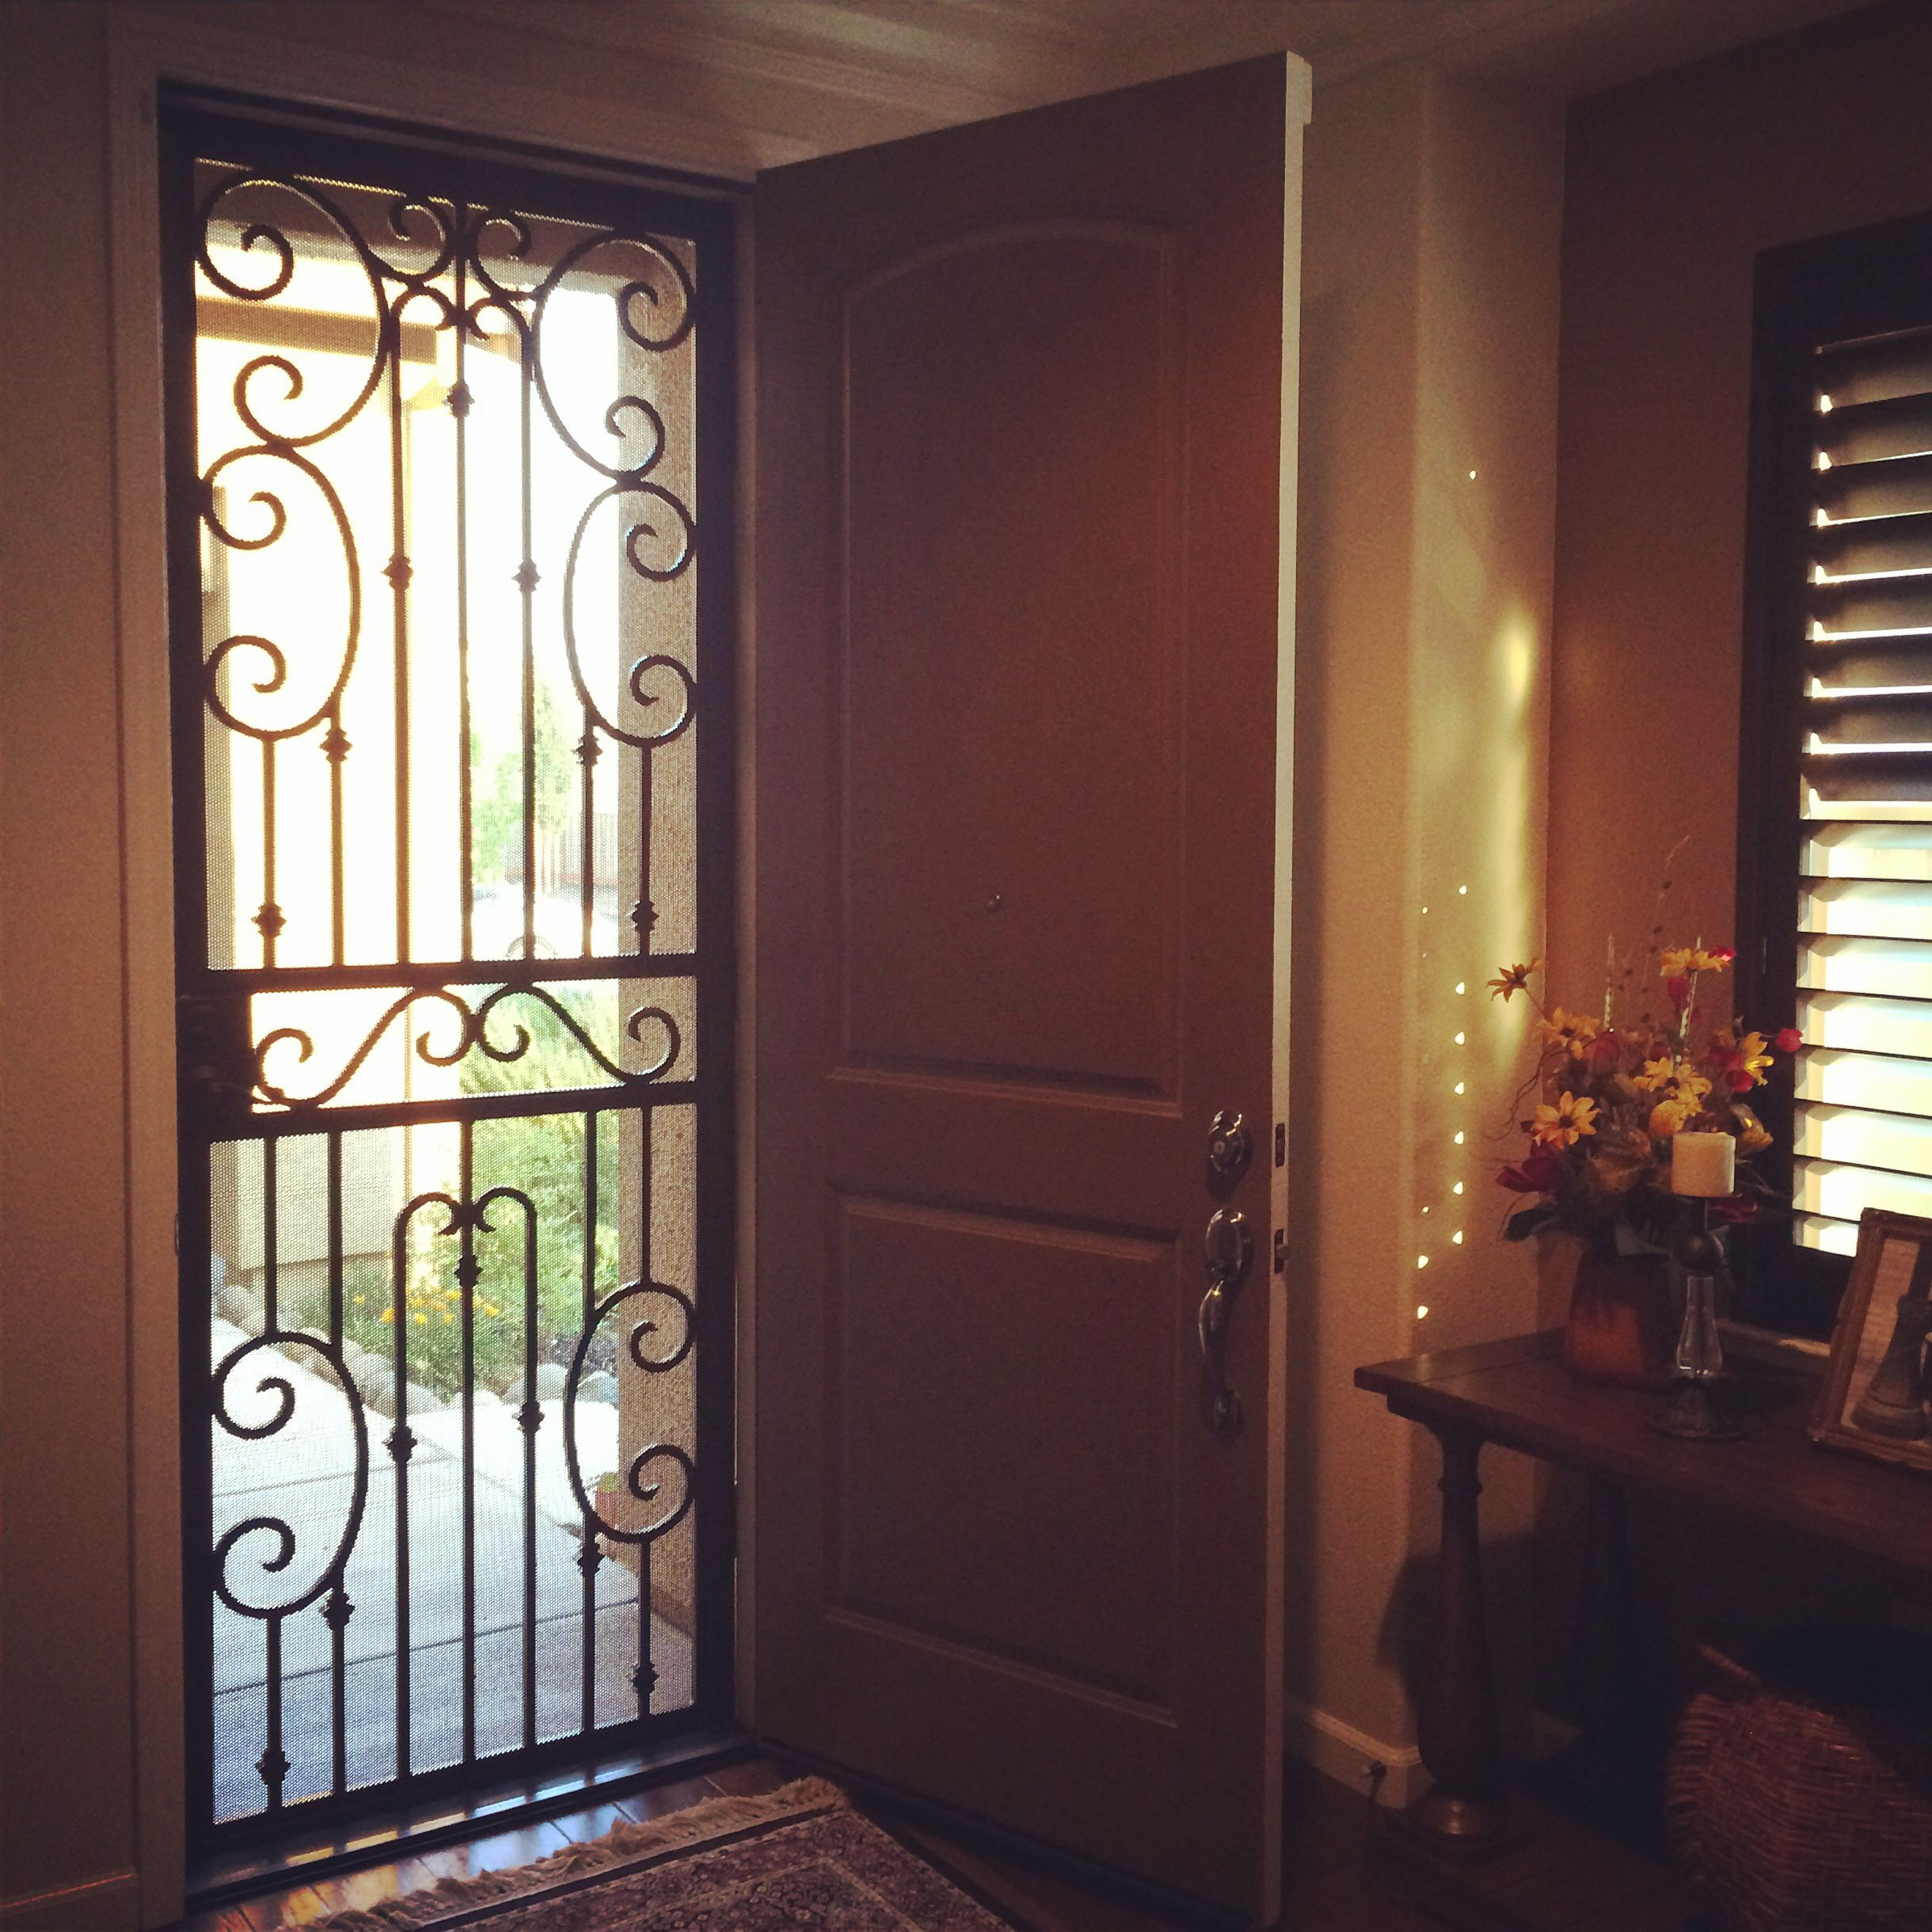 Security Screen Door -Spanish Style | Spanish decor ...